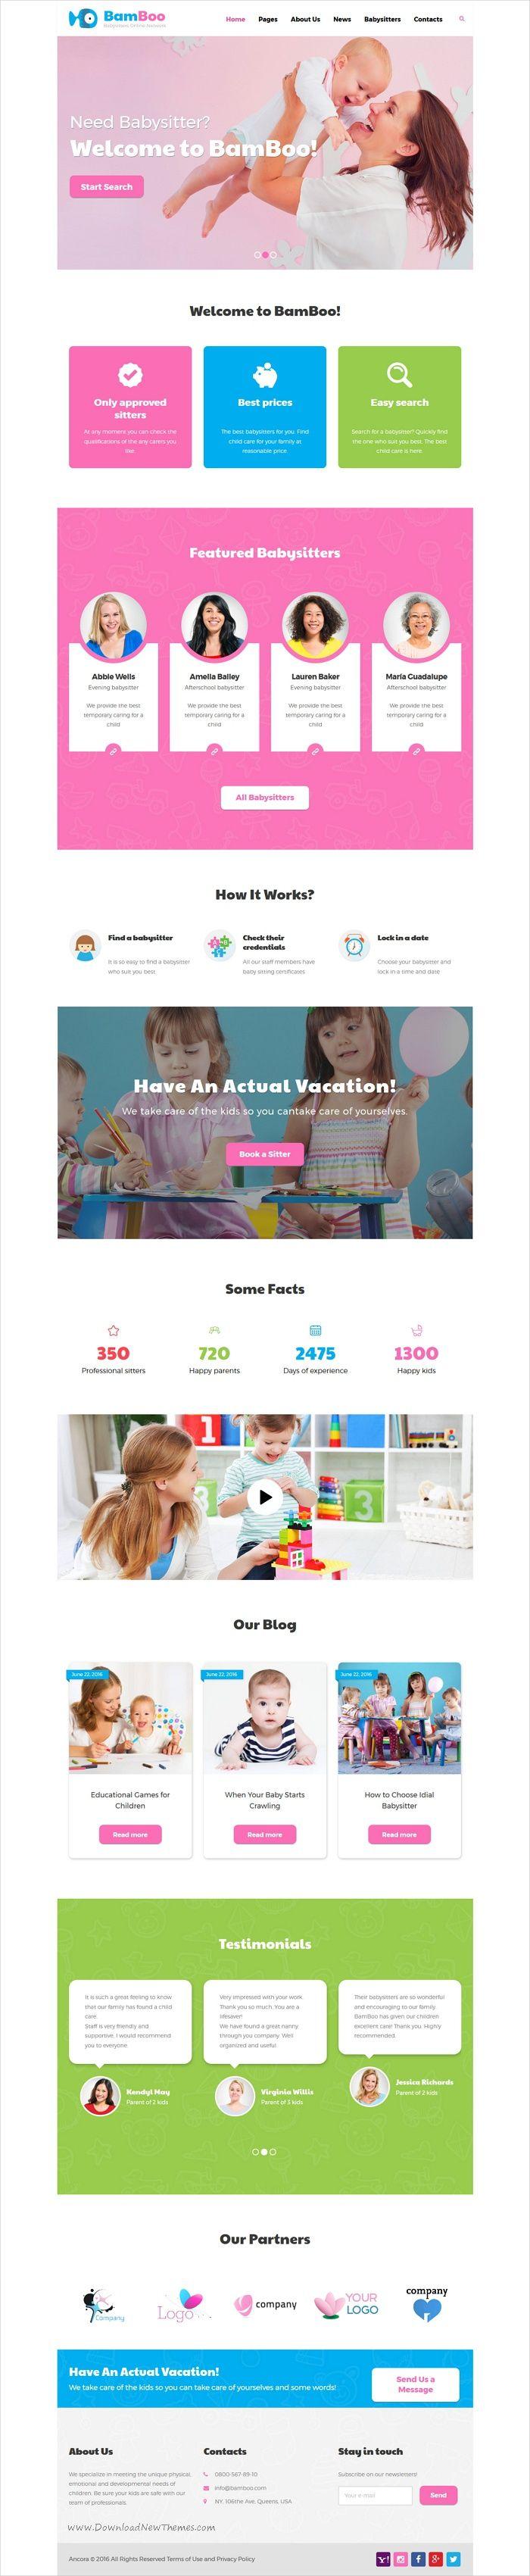 Bamboo is a modern and functional design #WordPress theme for #preschool, #kindergarten, #babysitters online network, professional nurses teams, nannies or children educational websites download now➩ https://themeforest.net/item/bamboo-babysitters-online-network-wp-theme/17324294?ref=Datasata